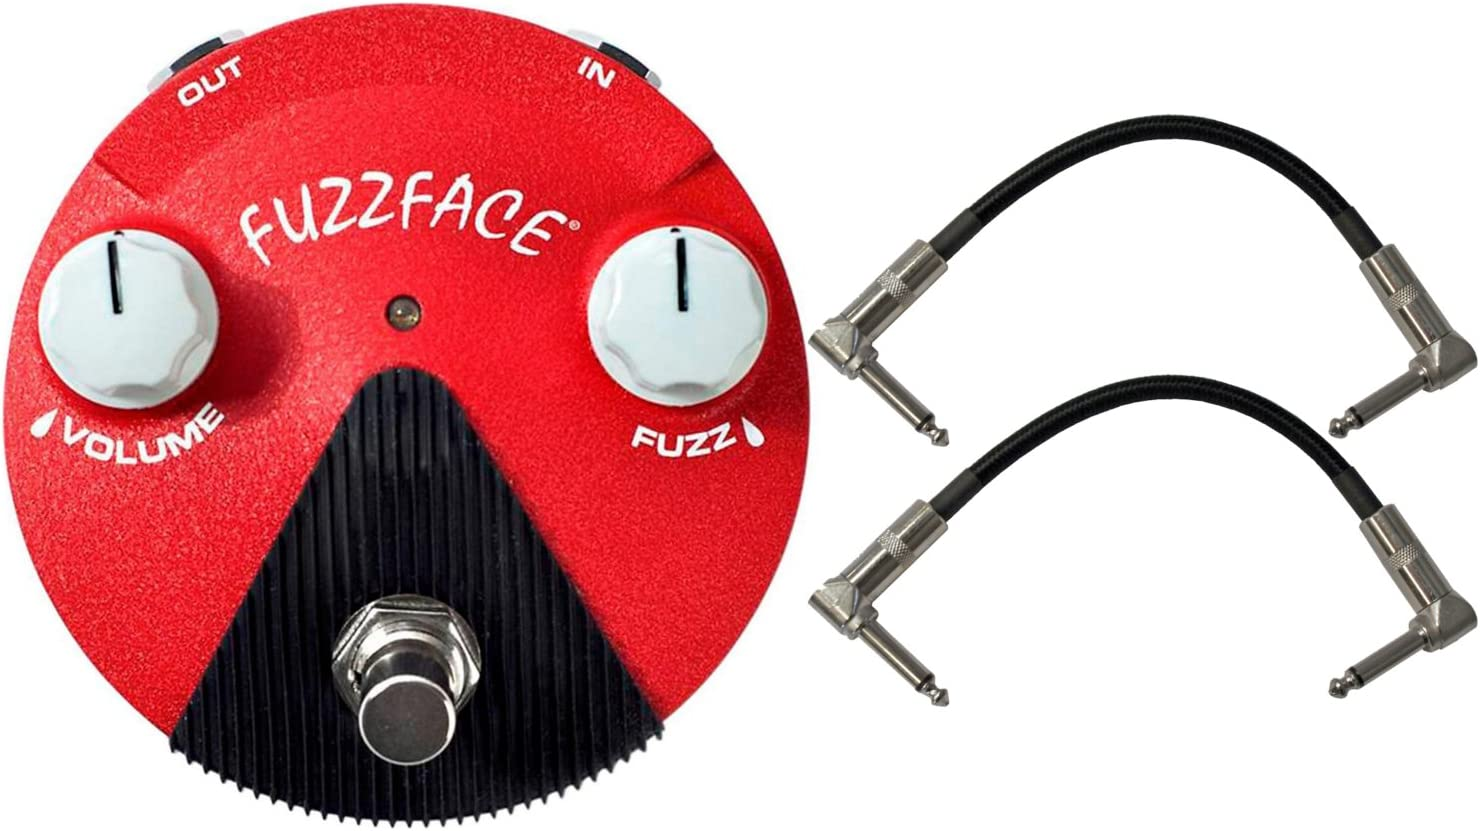 2 MXR CABLES Jim Dunlop Jimi Hendrix Band of Gypsys Mini Fuzz Face FFM6